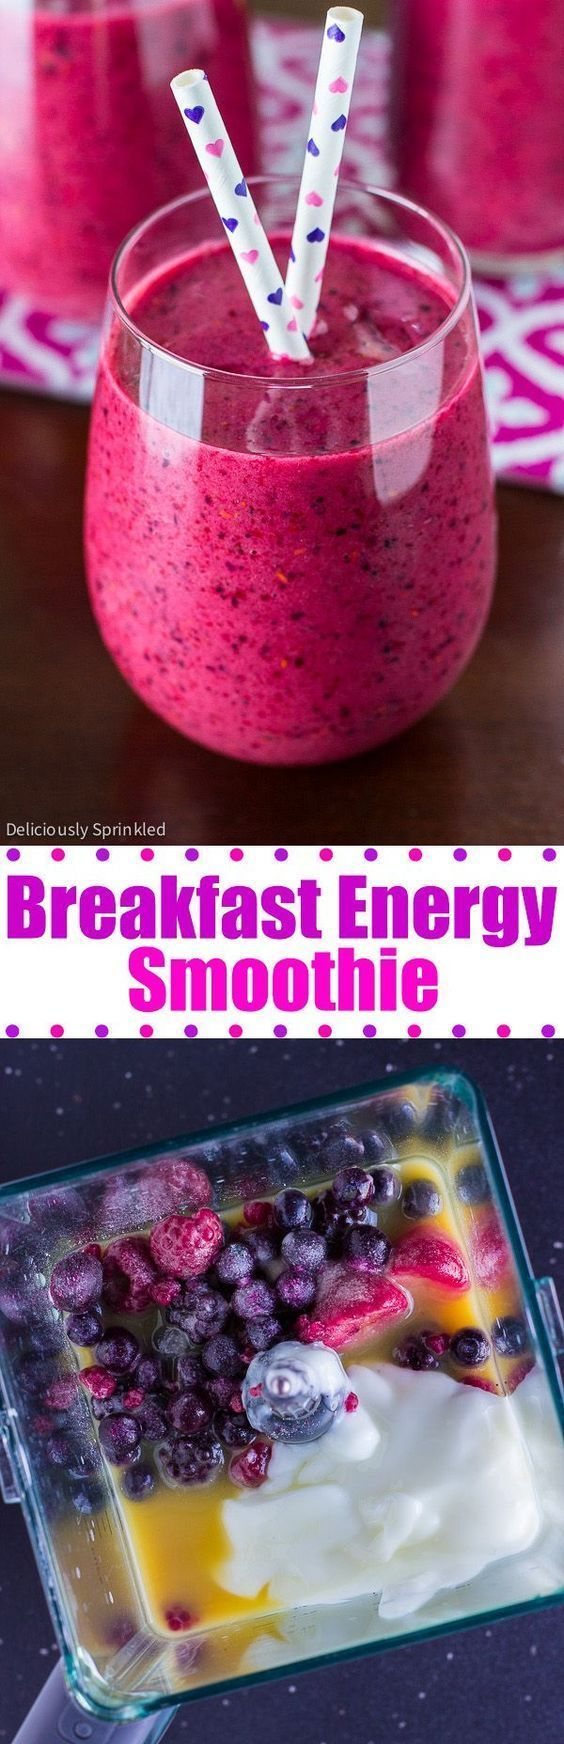 Over 20 Amazing Smoothie Recipes To Make!